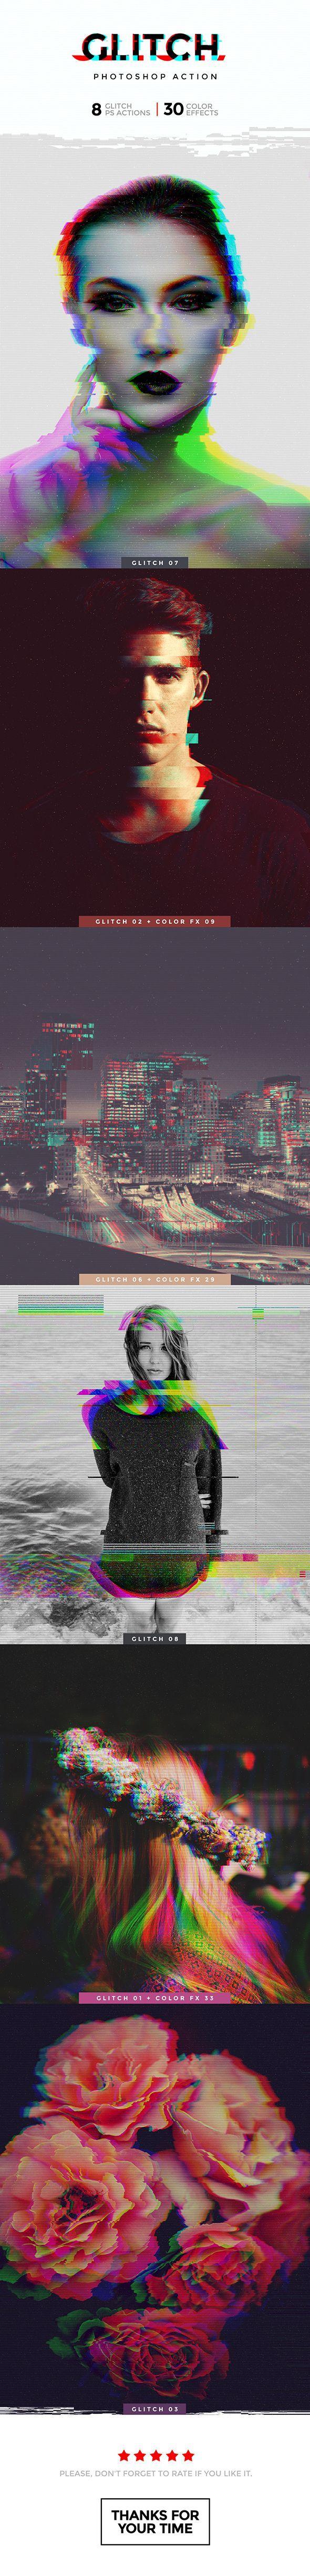 Glitch Photoshop Action — Photoshop ATN #music #pixels • Download ➝ https://graphicriver.net/item/glitch-photoshop-action/19144570?ref=pxcr #AdobePhotoshopTutorial